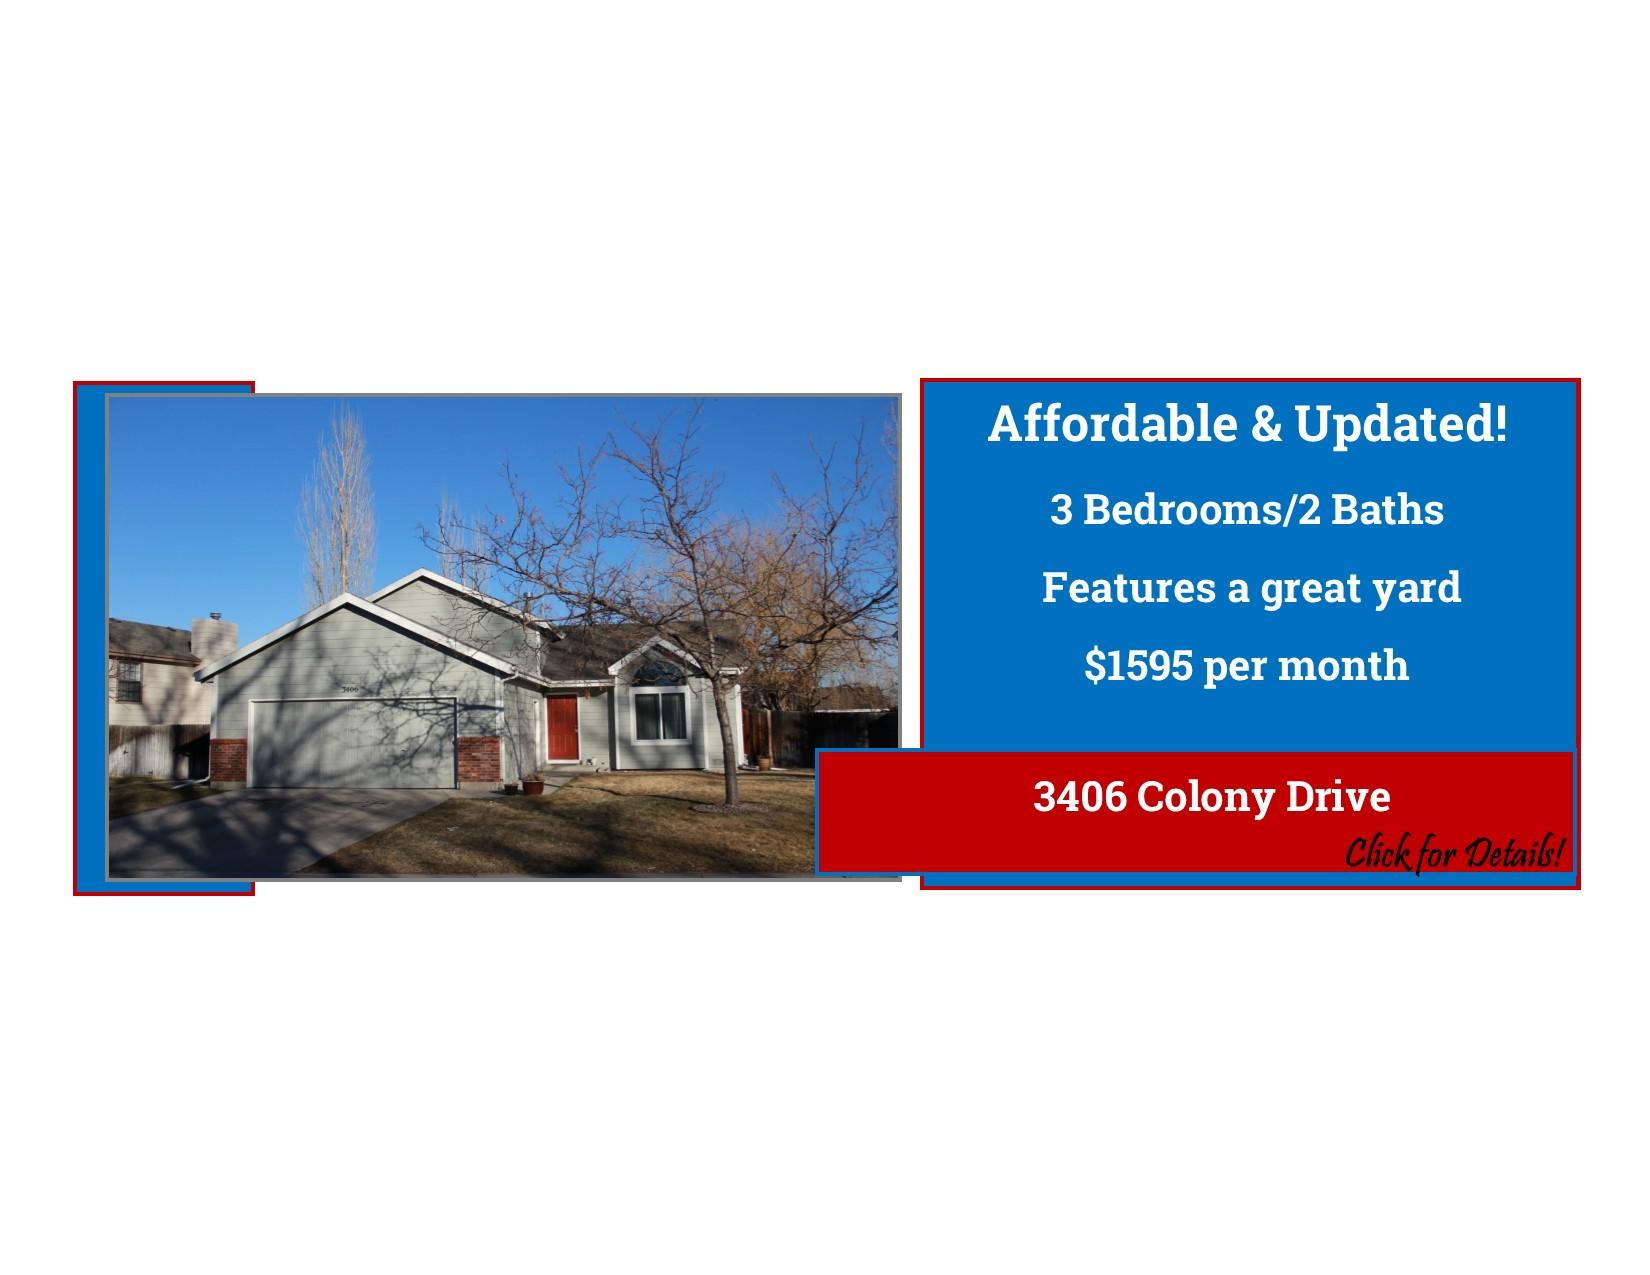 3406 Colony Drive